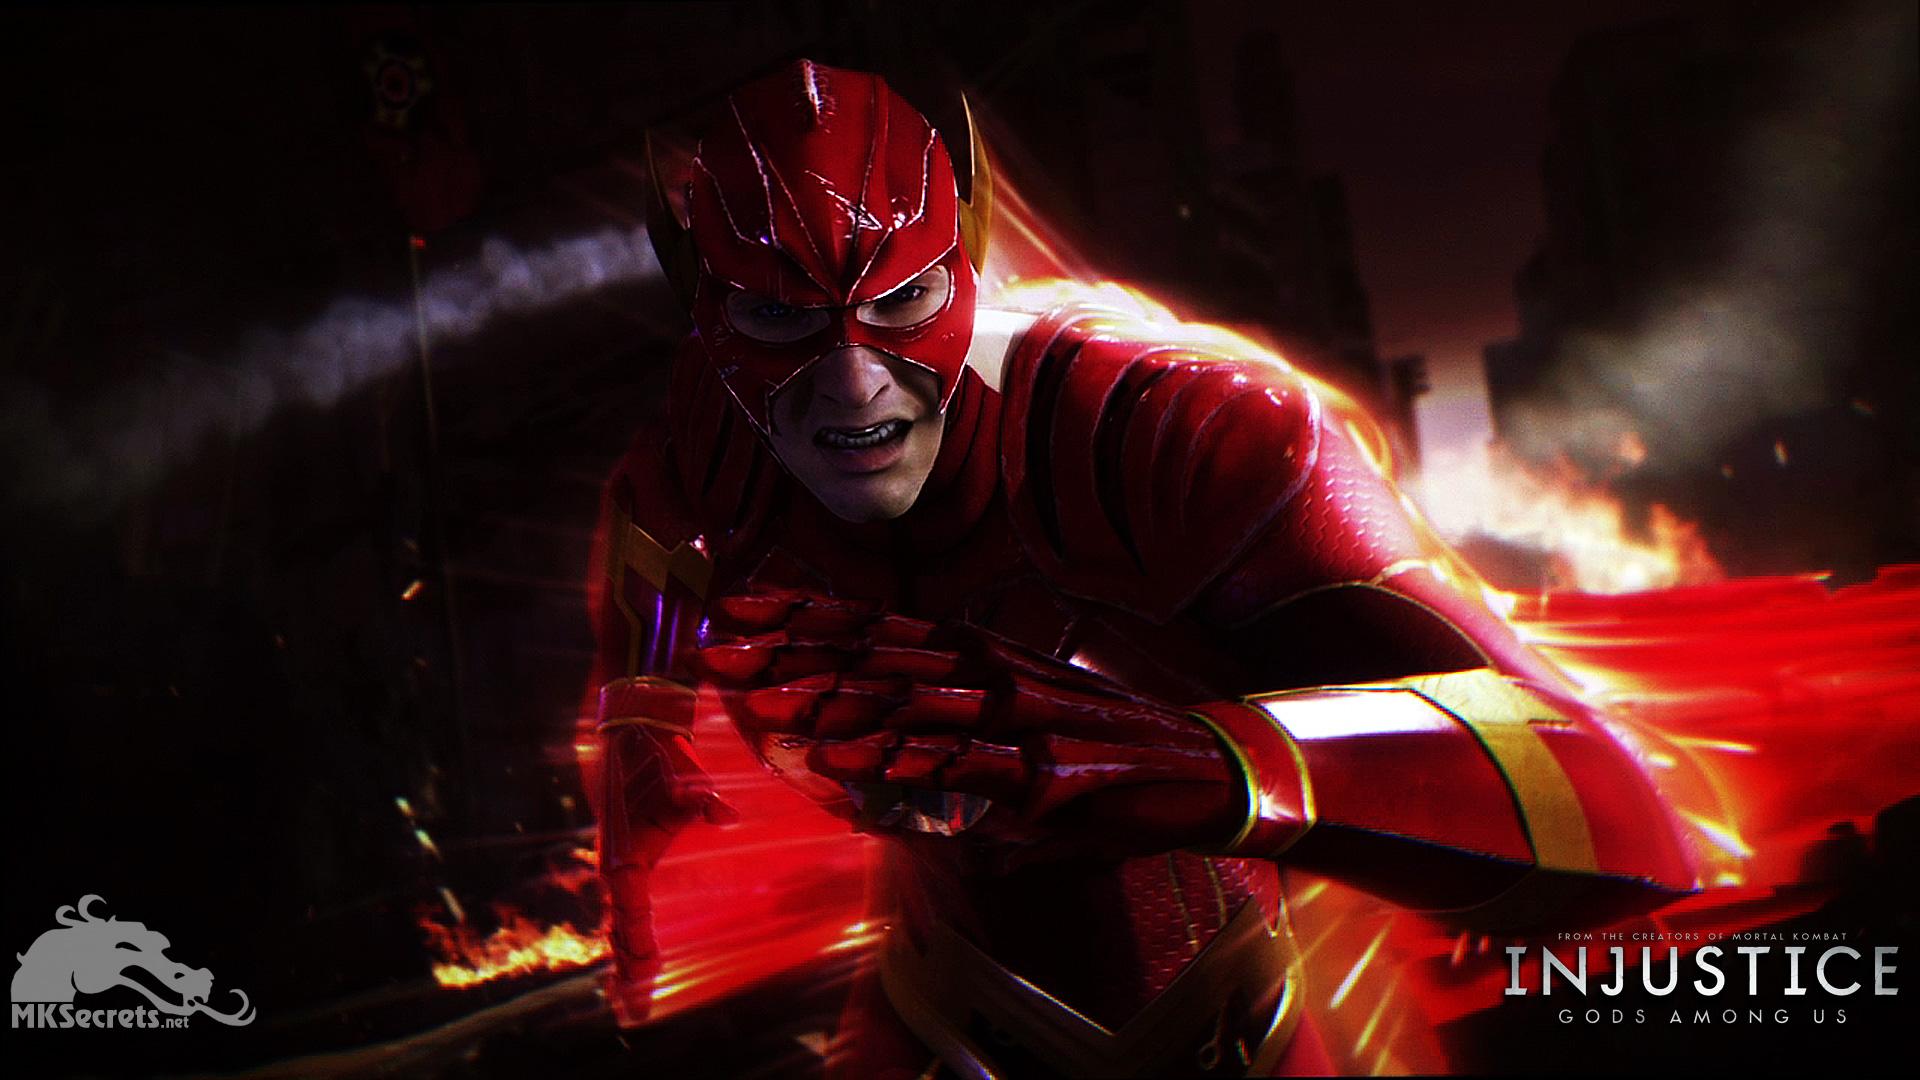 Injustice Gods Among Us   The Flash 1920x1080